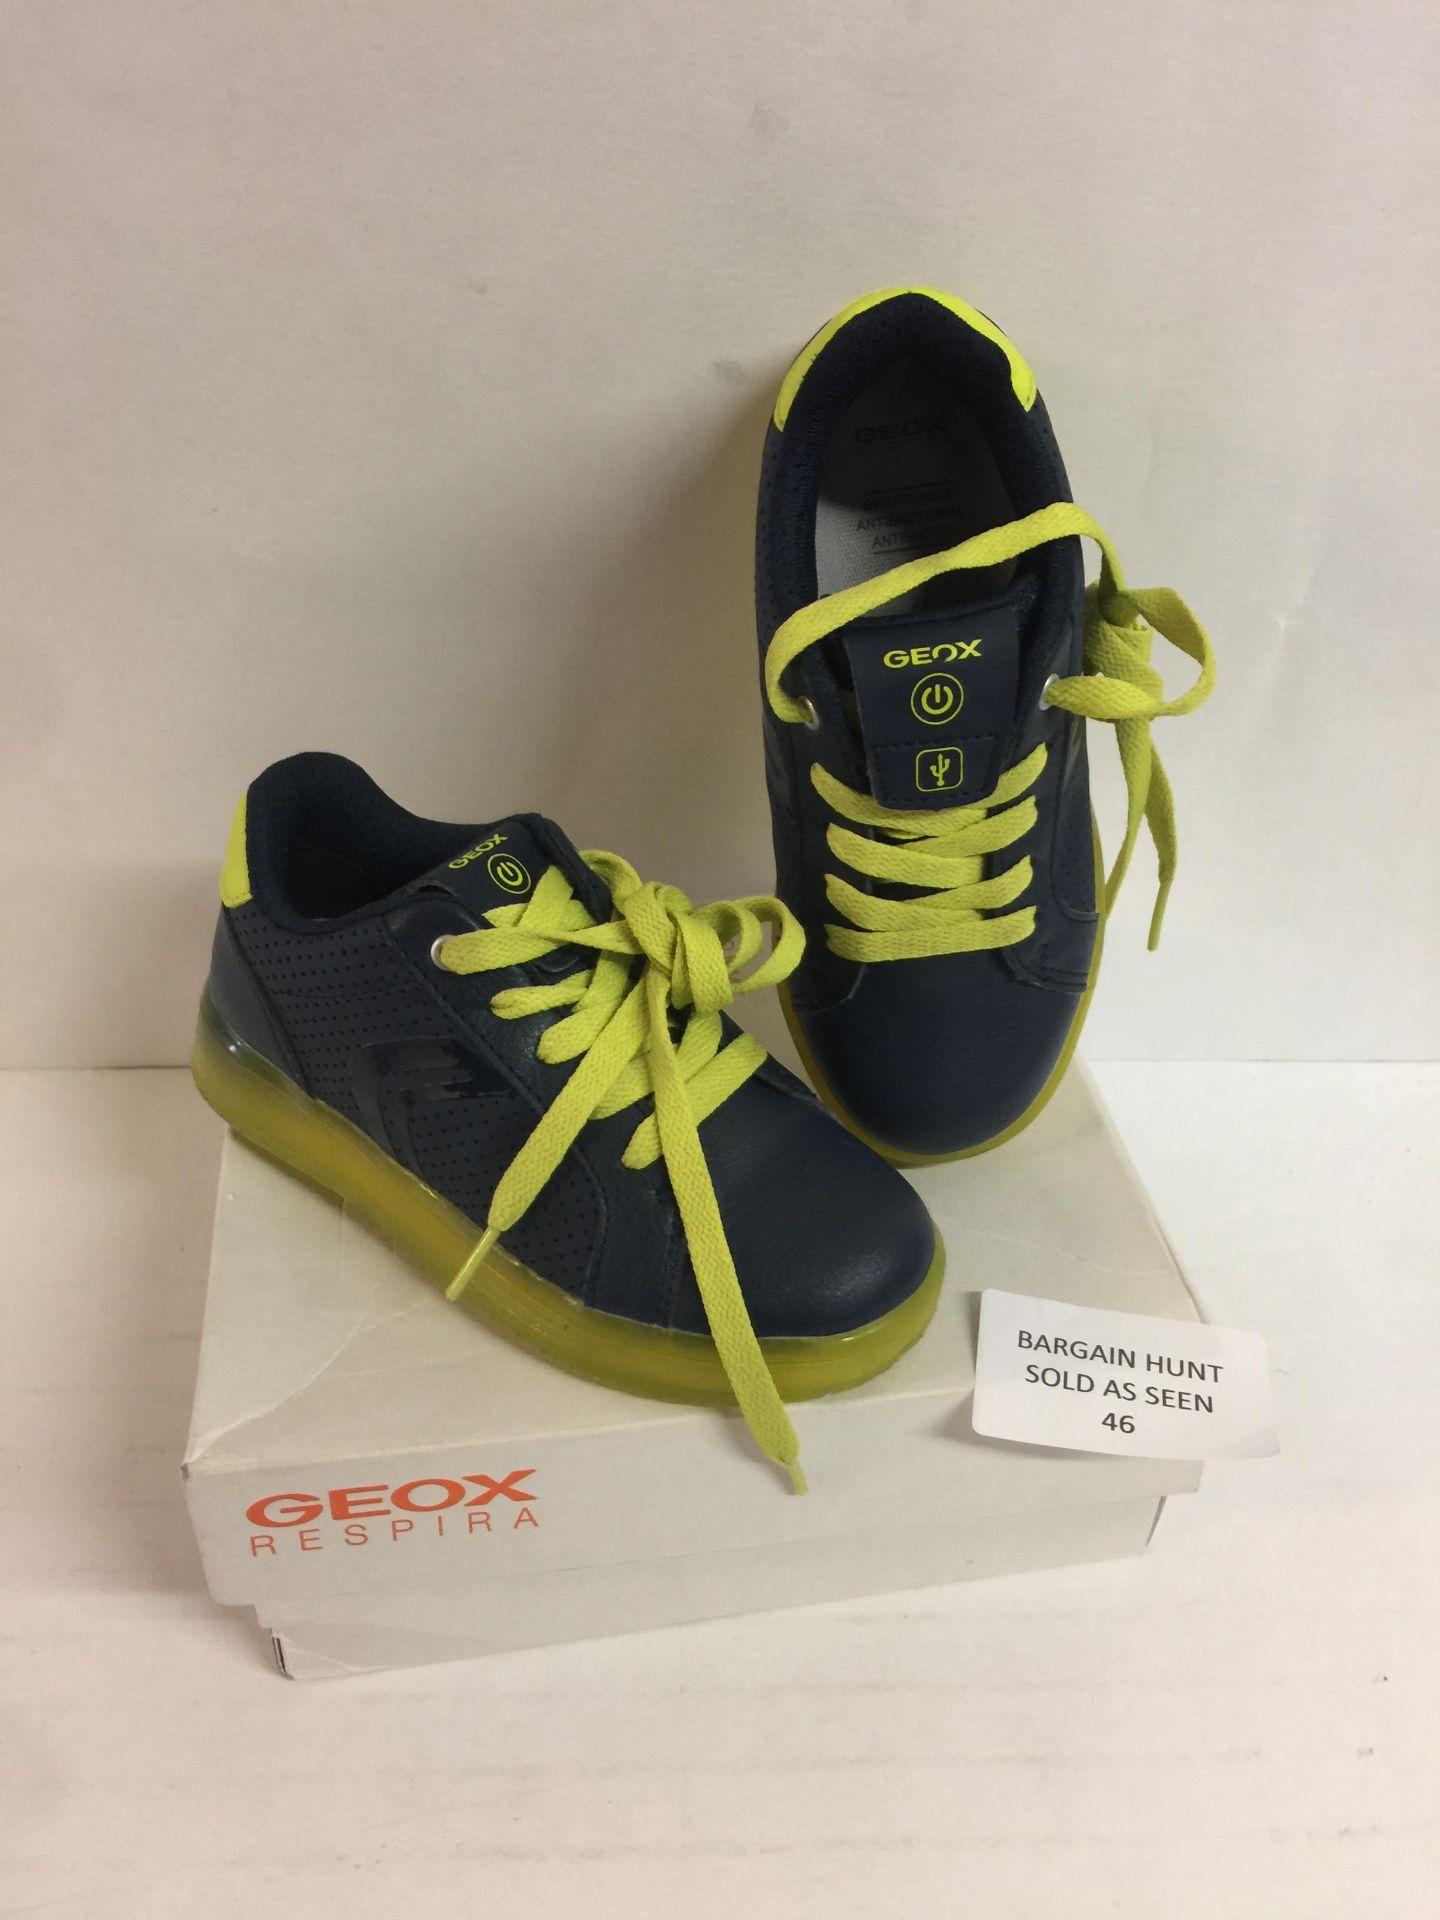 Lot 46 - Geox Boy's Shoe, 29 EU